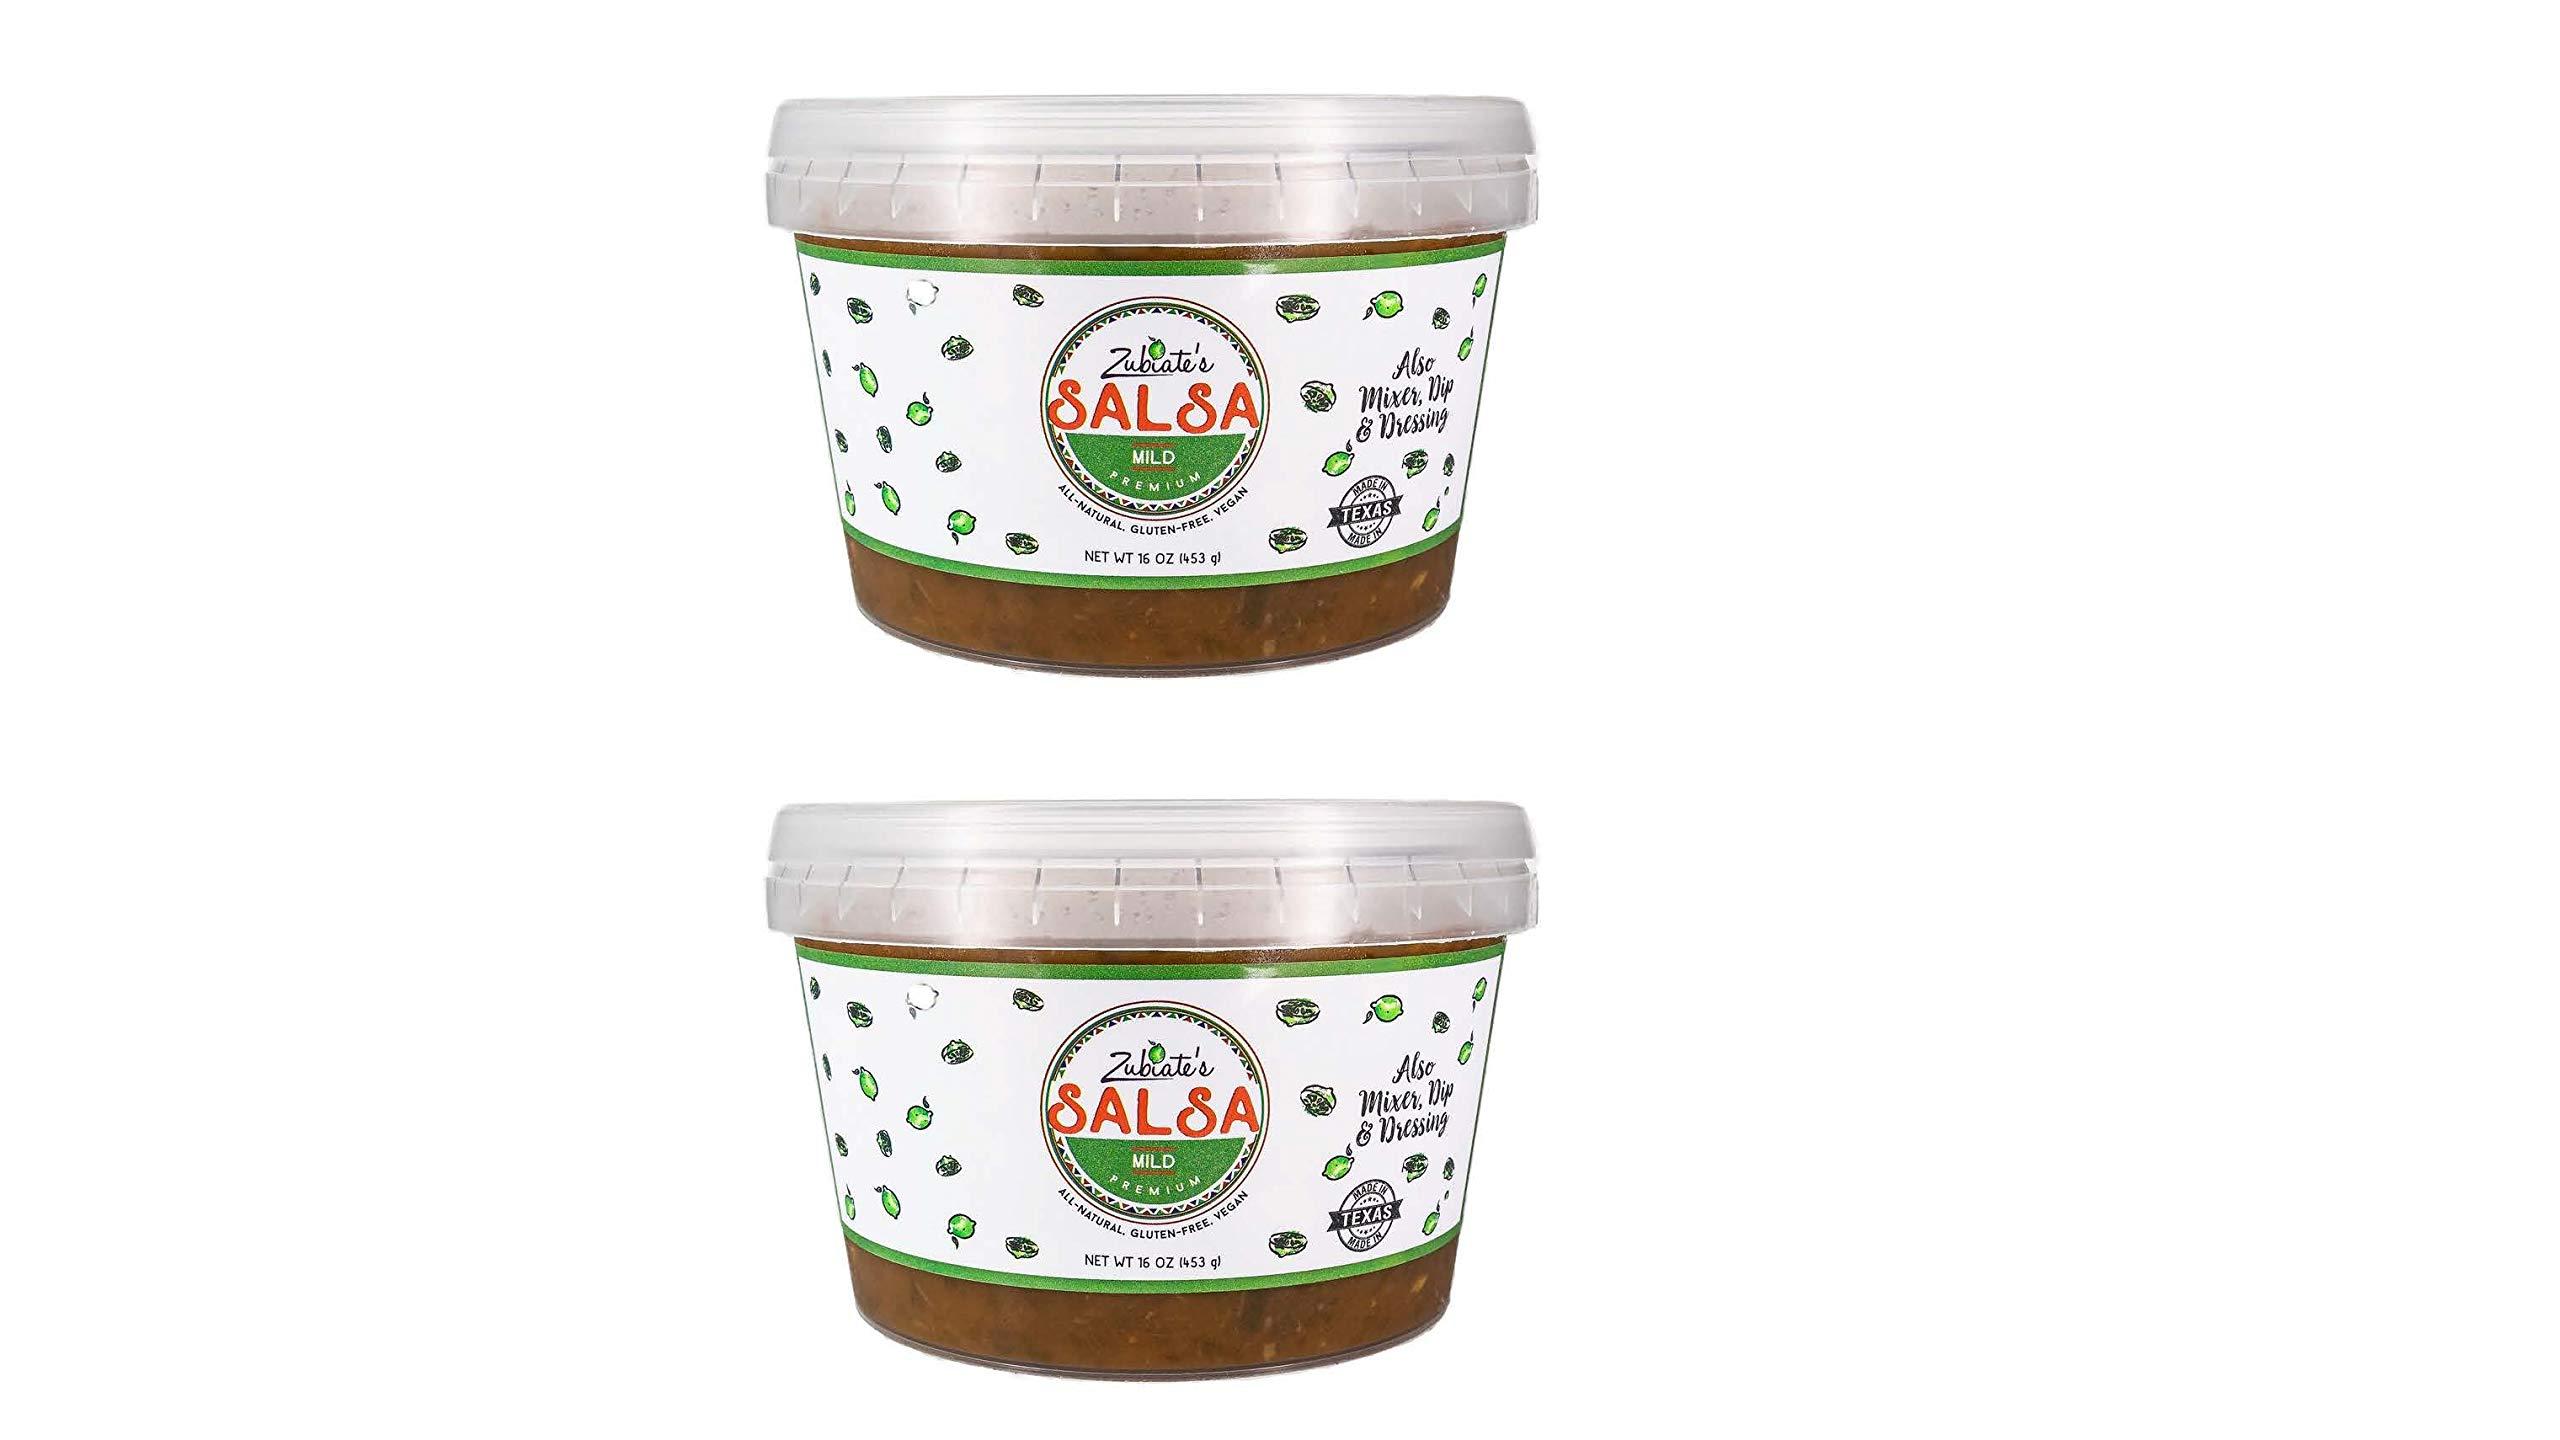 Zubiates Cocina, Fresh & All Natural Salsa,16 oz (Mild, ...